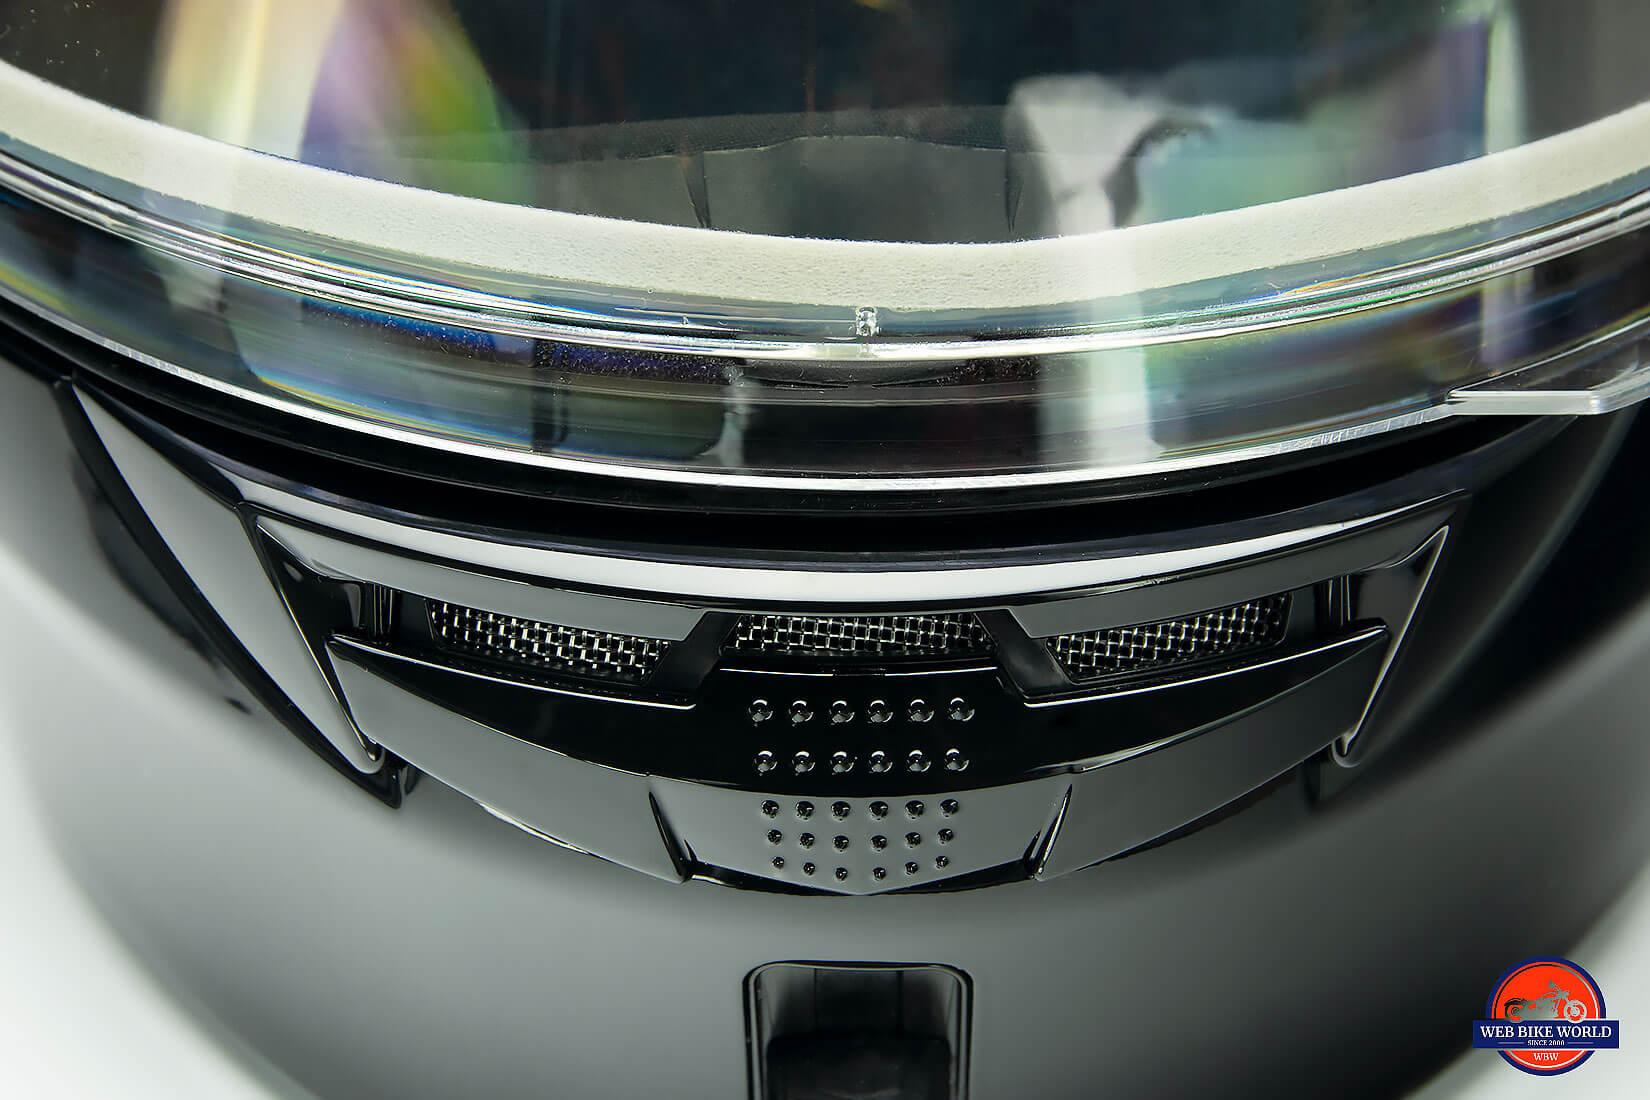 GMax MD01 helmet chinbar vent open.